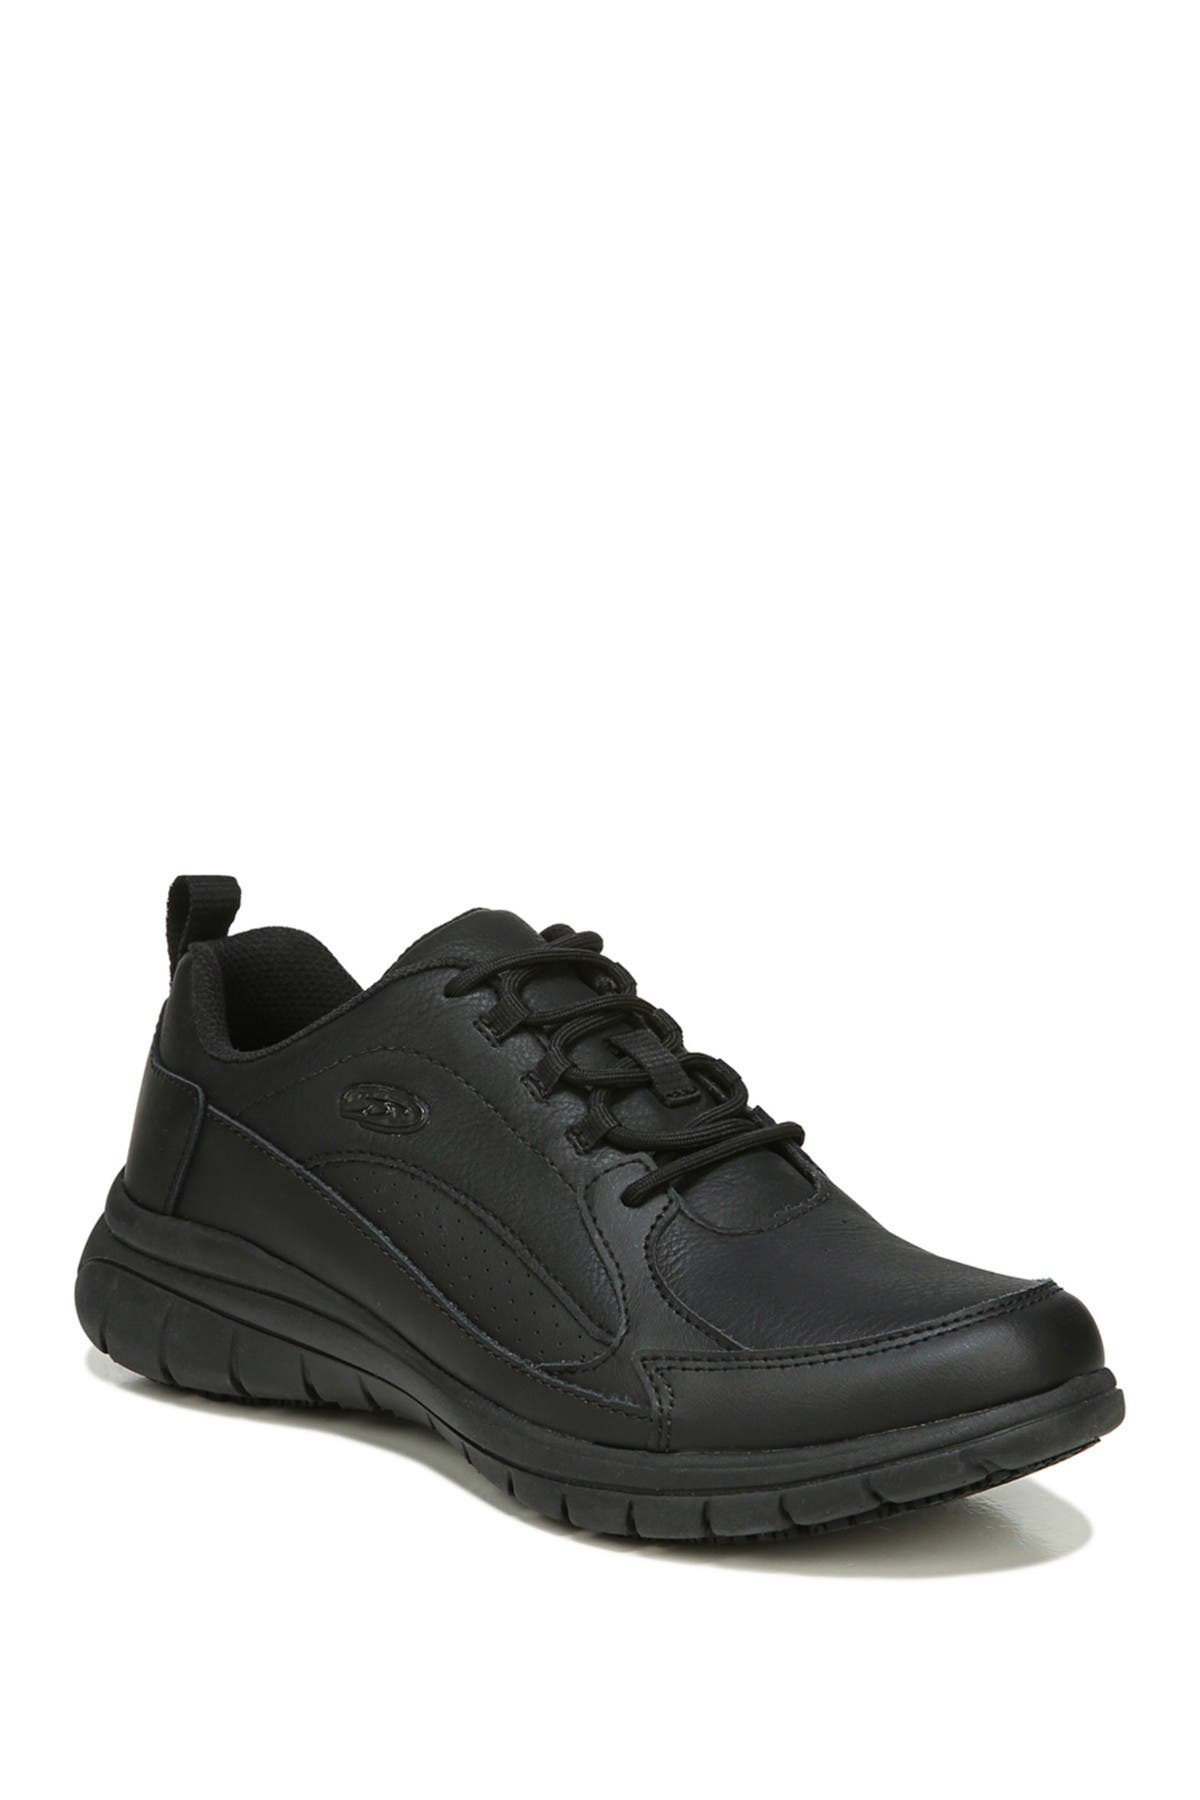 Image of Dr. Scholl's Vivacity Sneaker